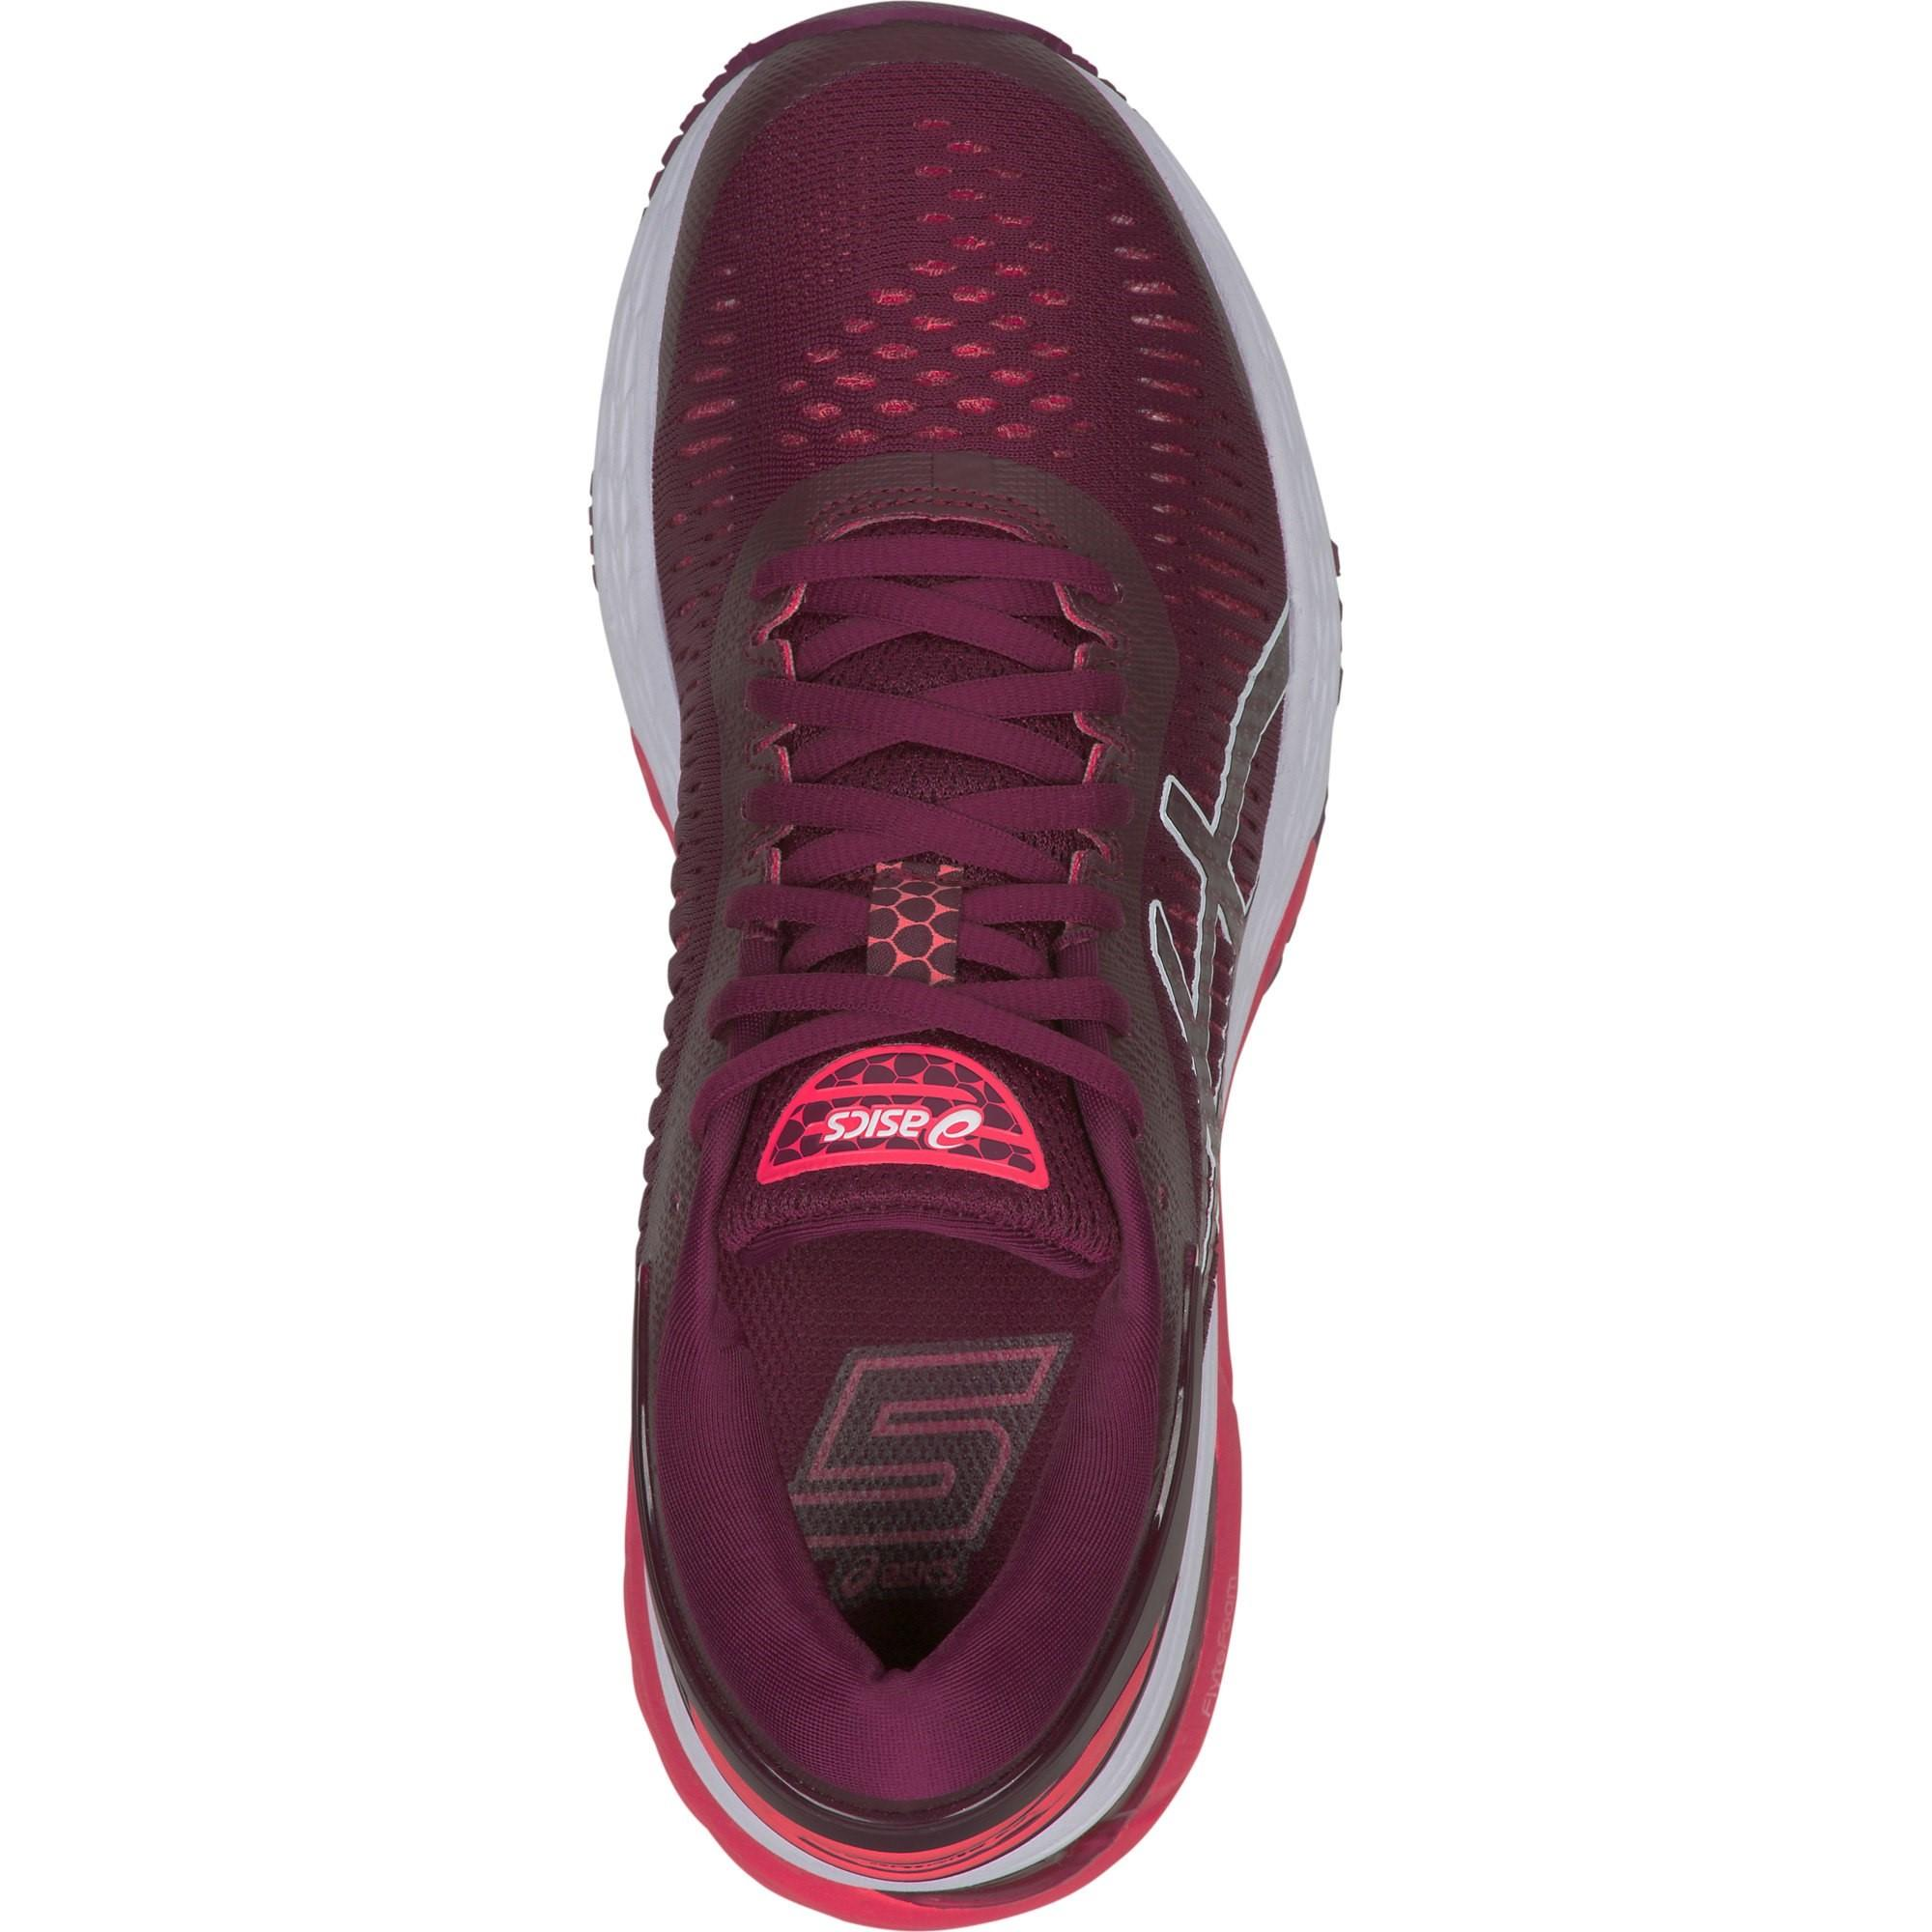 eabdaa0b Asics Womens GEL-Kayano 25 Running Shoes - Roselle/Pink